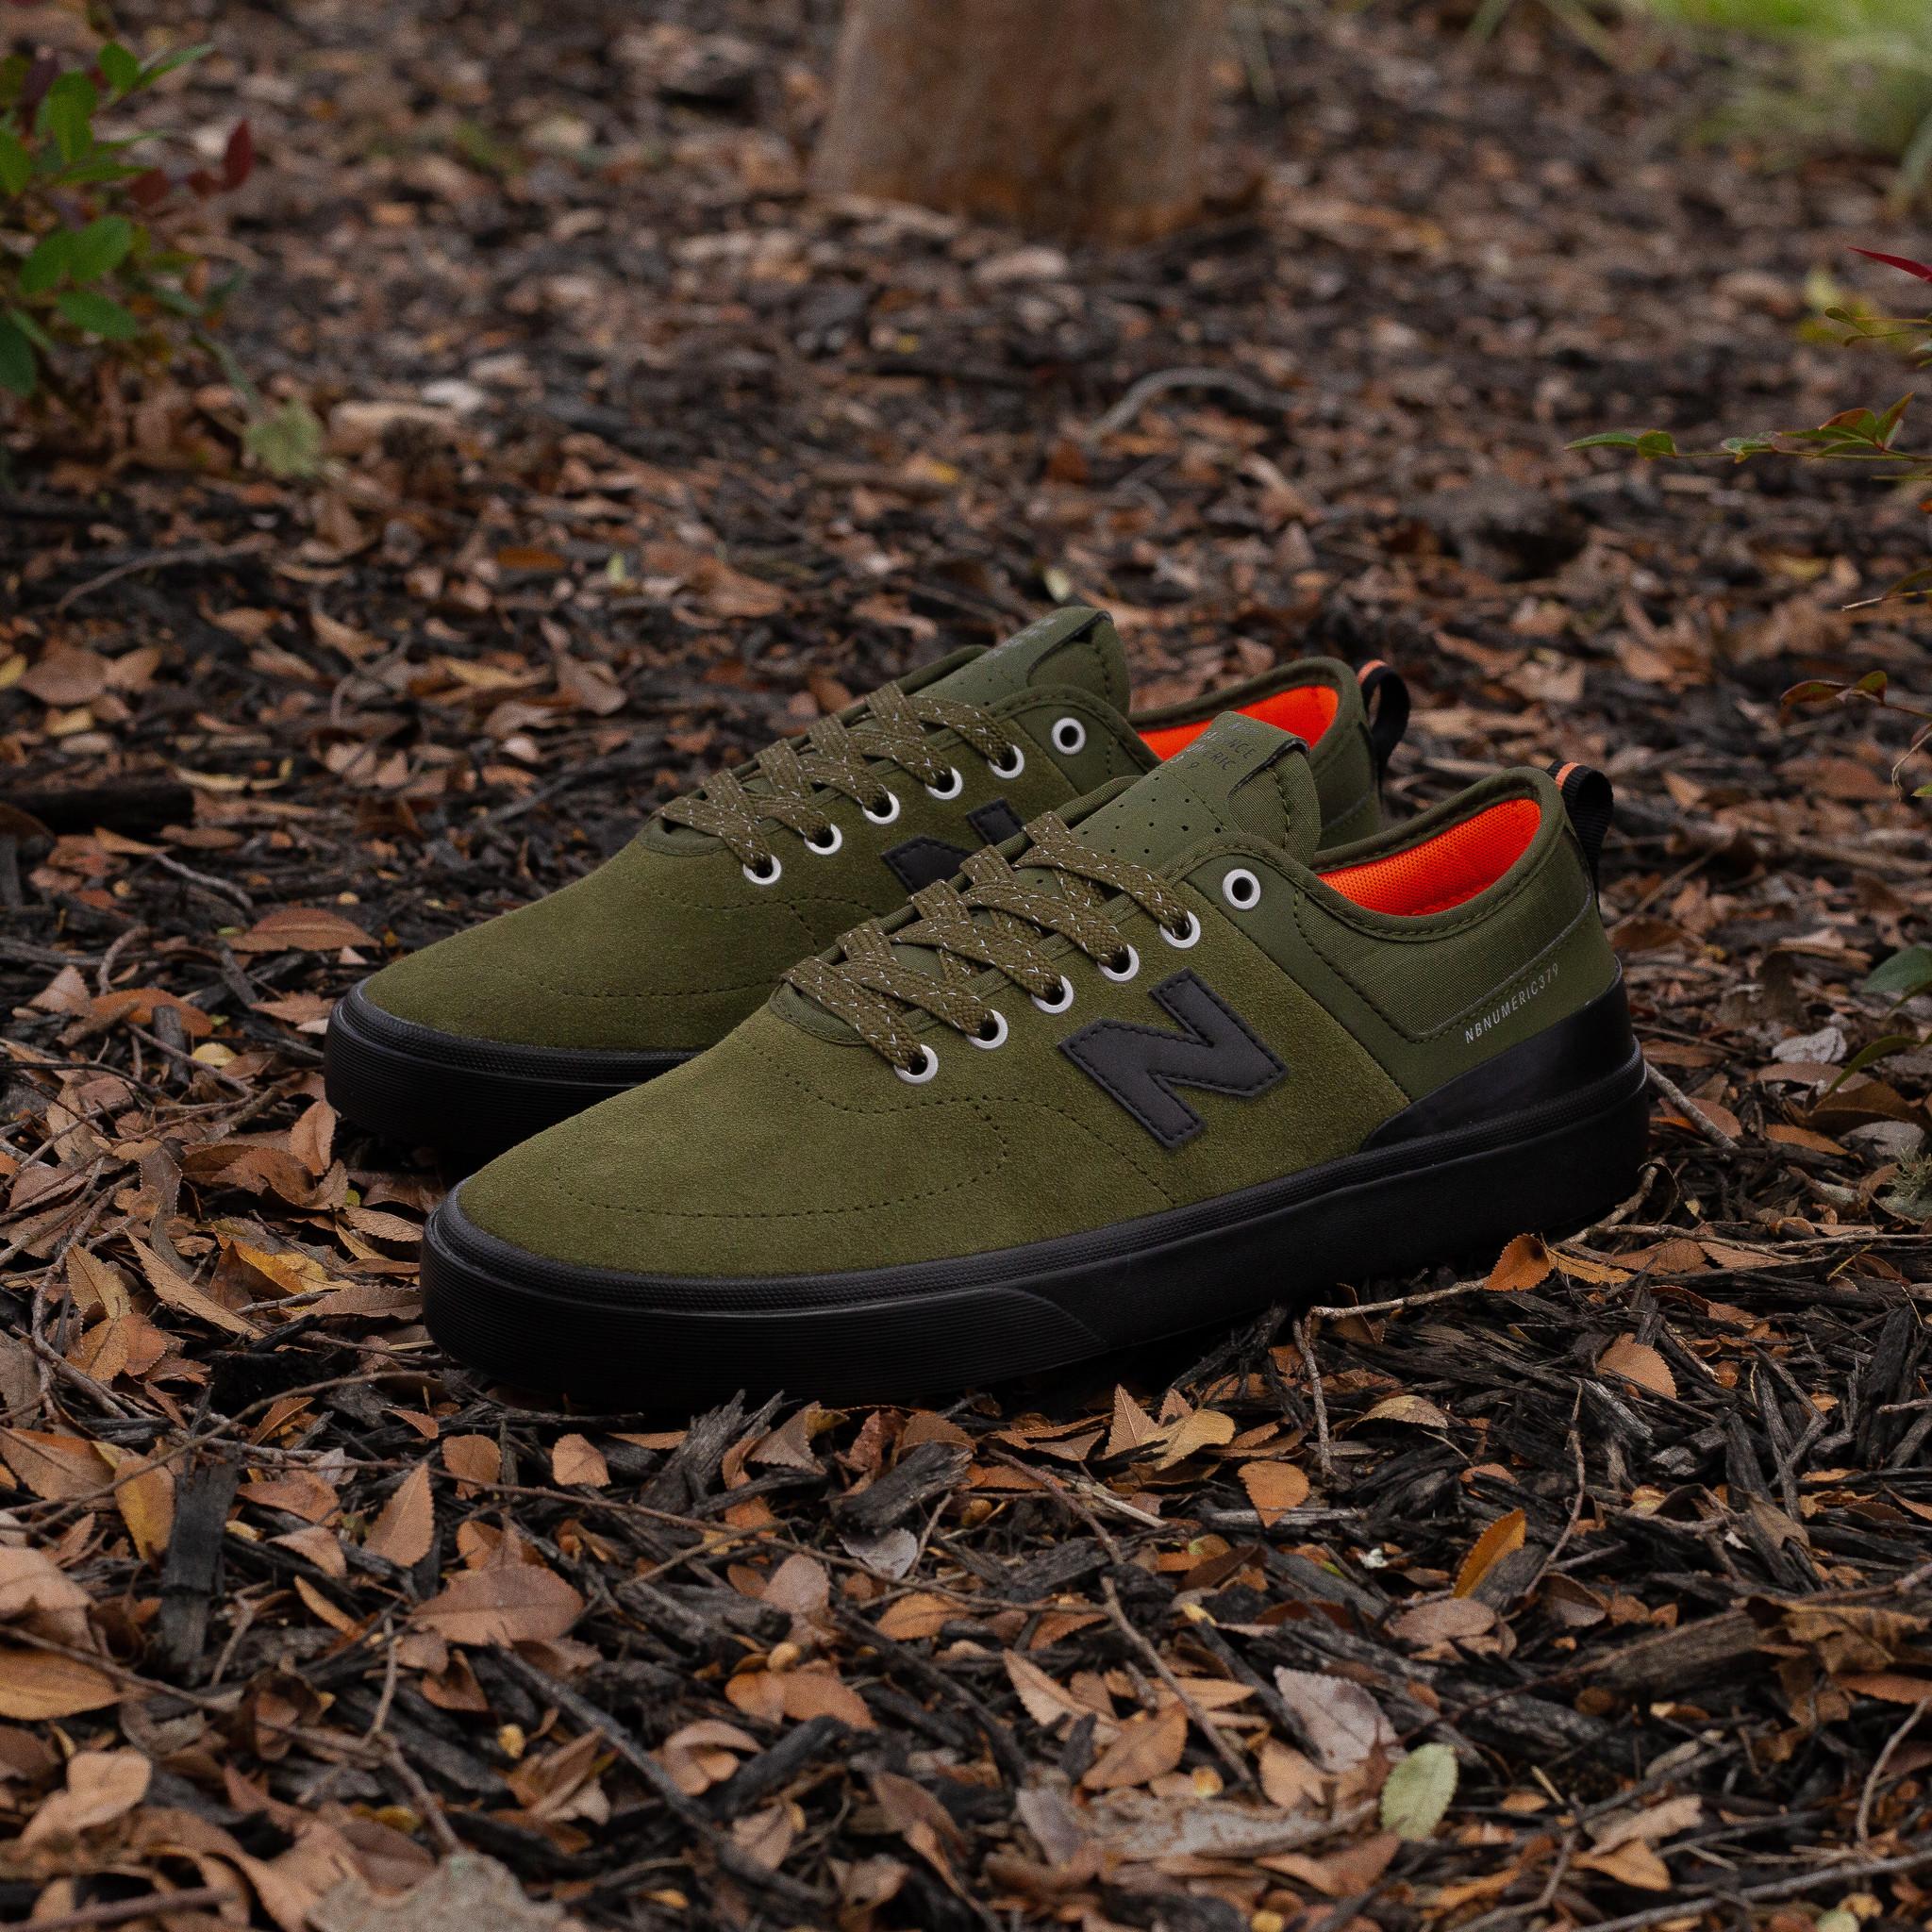 New Balance New Blance 379 olive/black